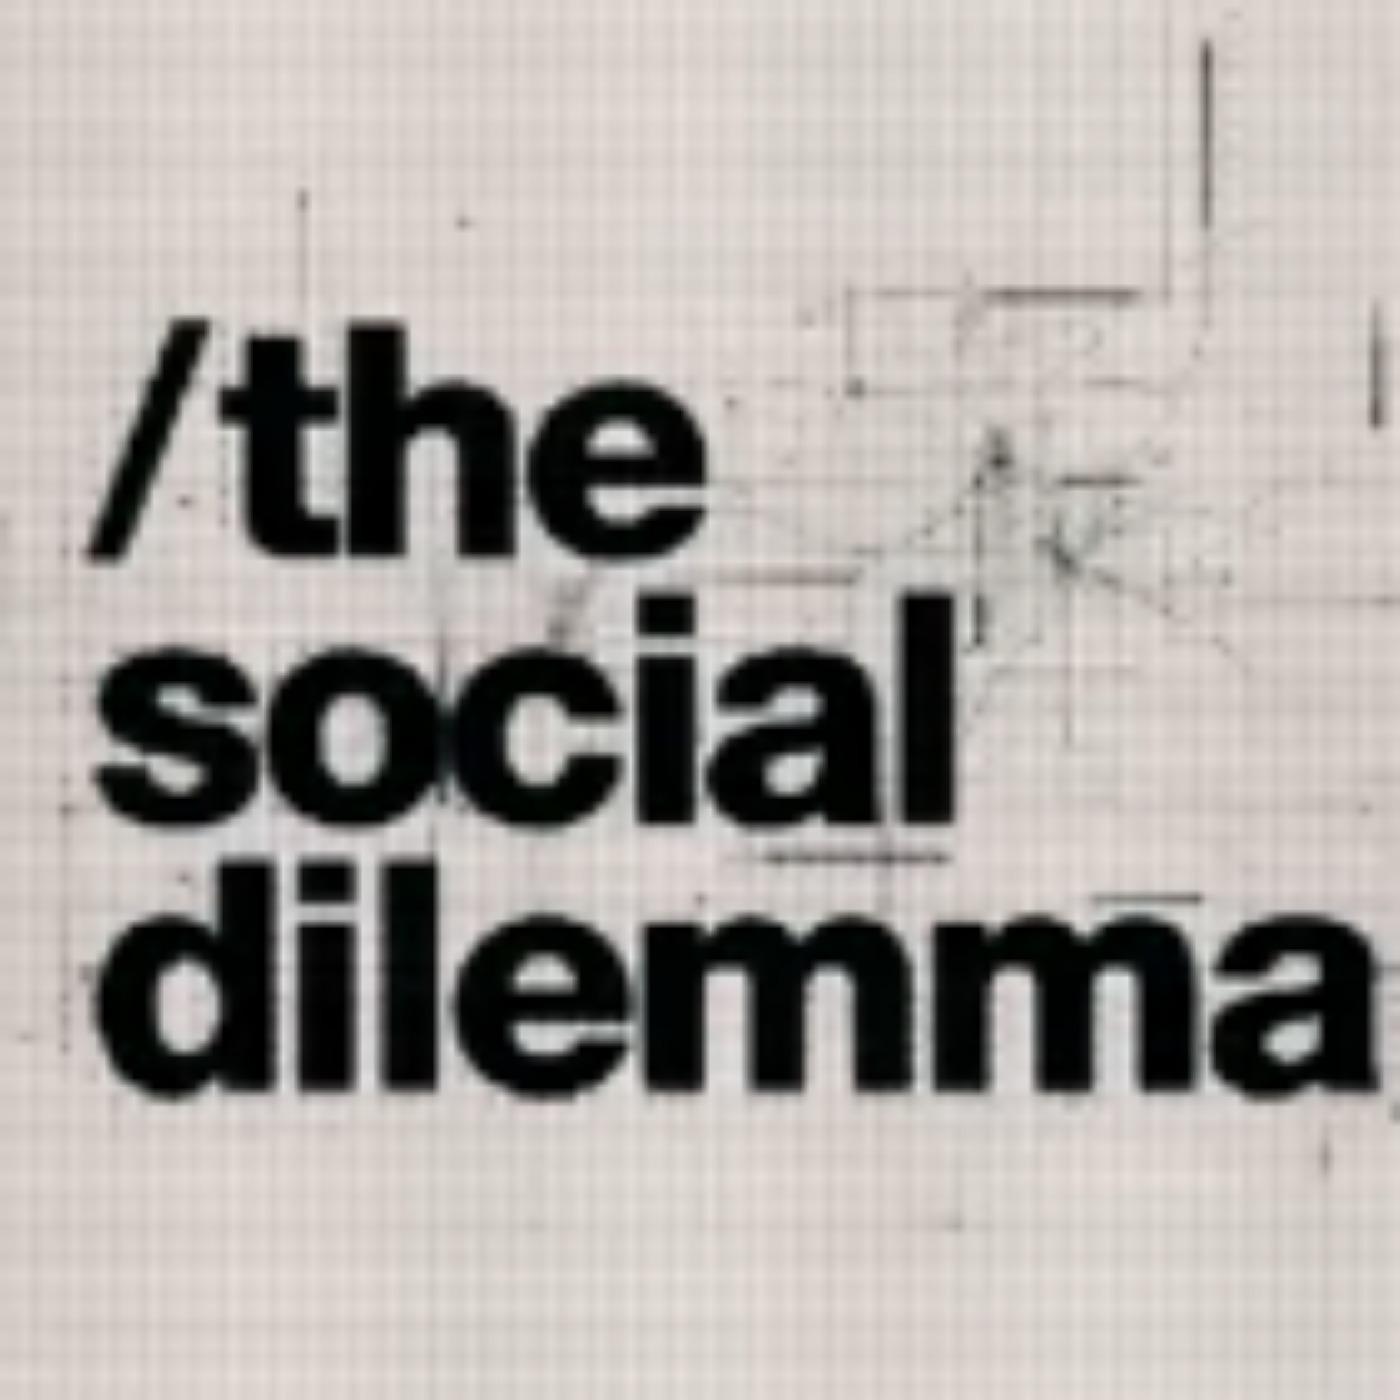 Everyday Tech Rewind - The Social Dilemma on Netflix